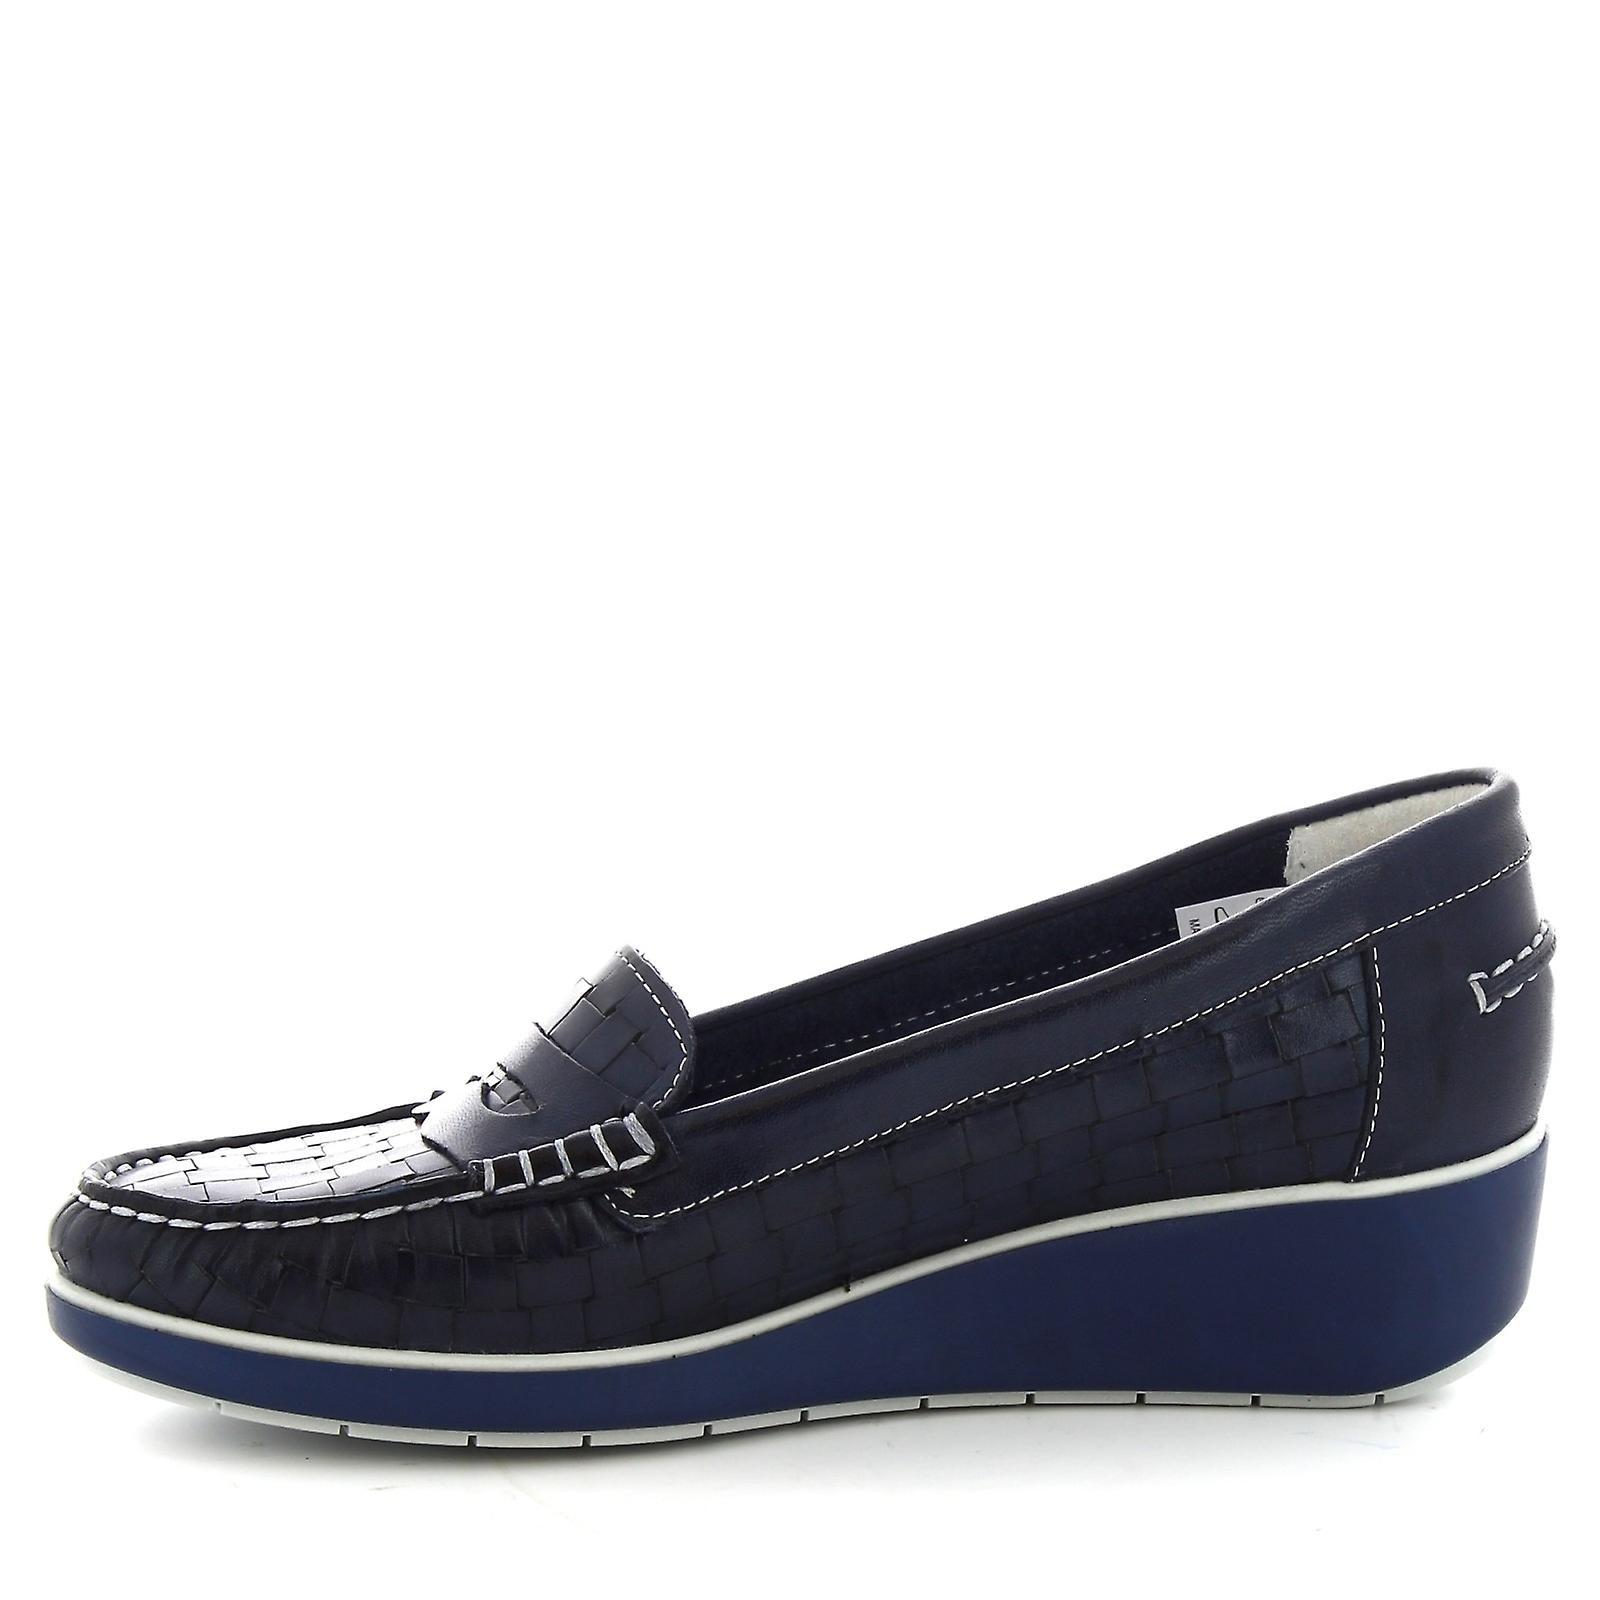 Leonardo Shoes Women's handmade slip-on loafers in blue woven calf leather